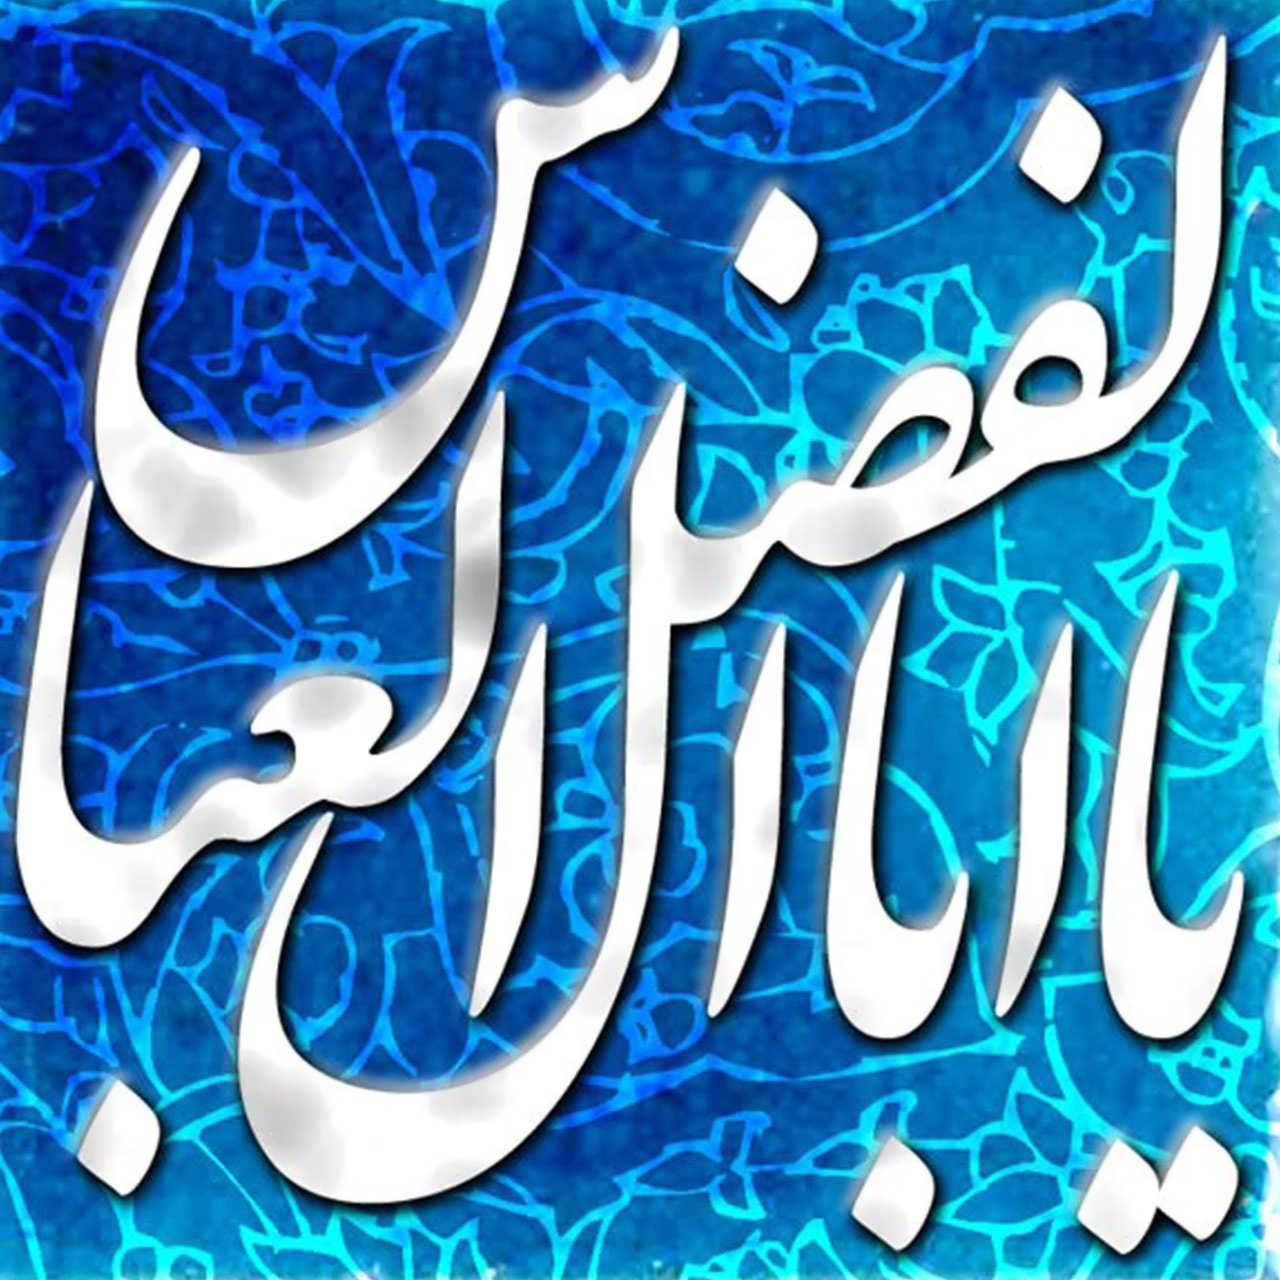 پروفایل محرم ابوالفضل عباس